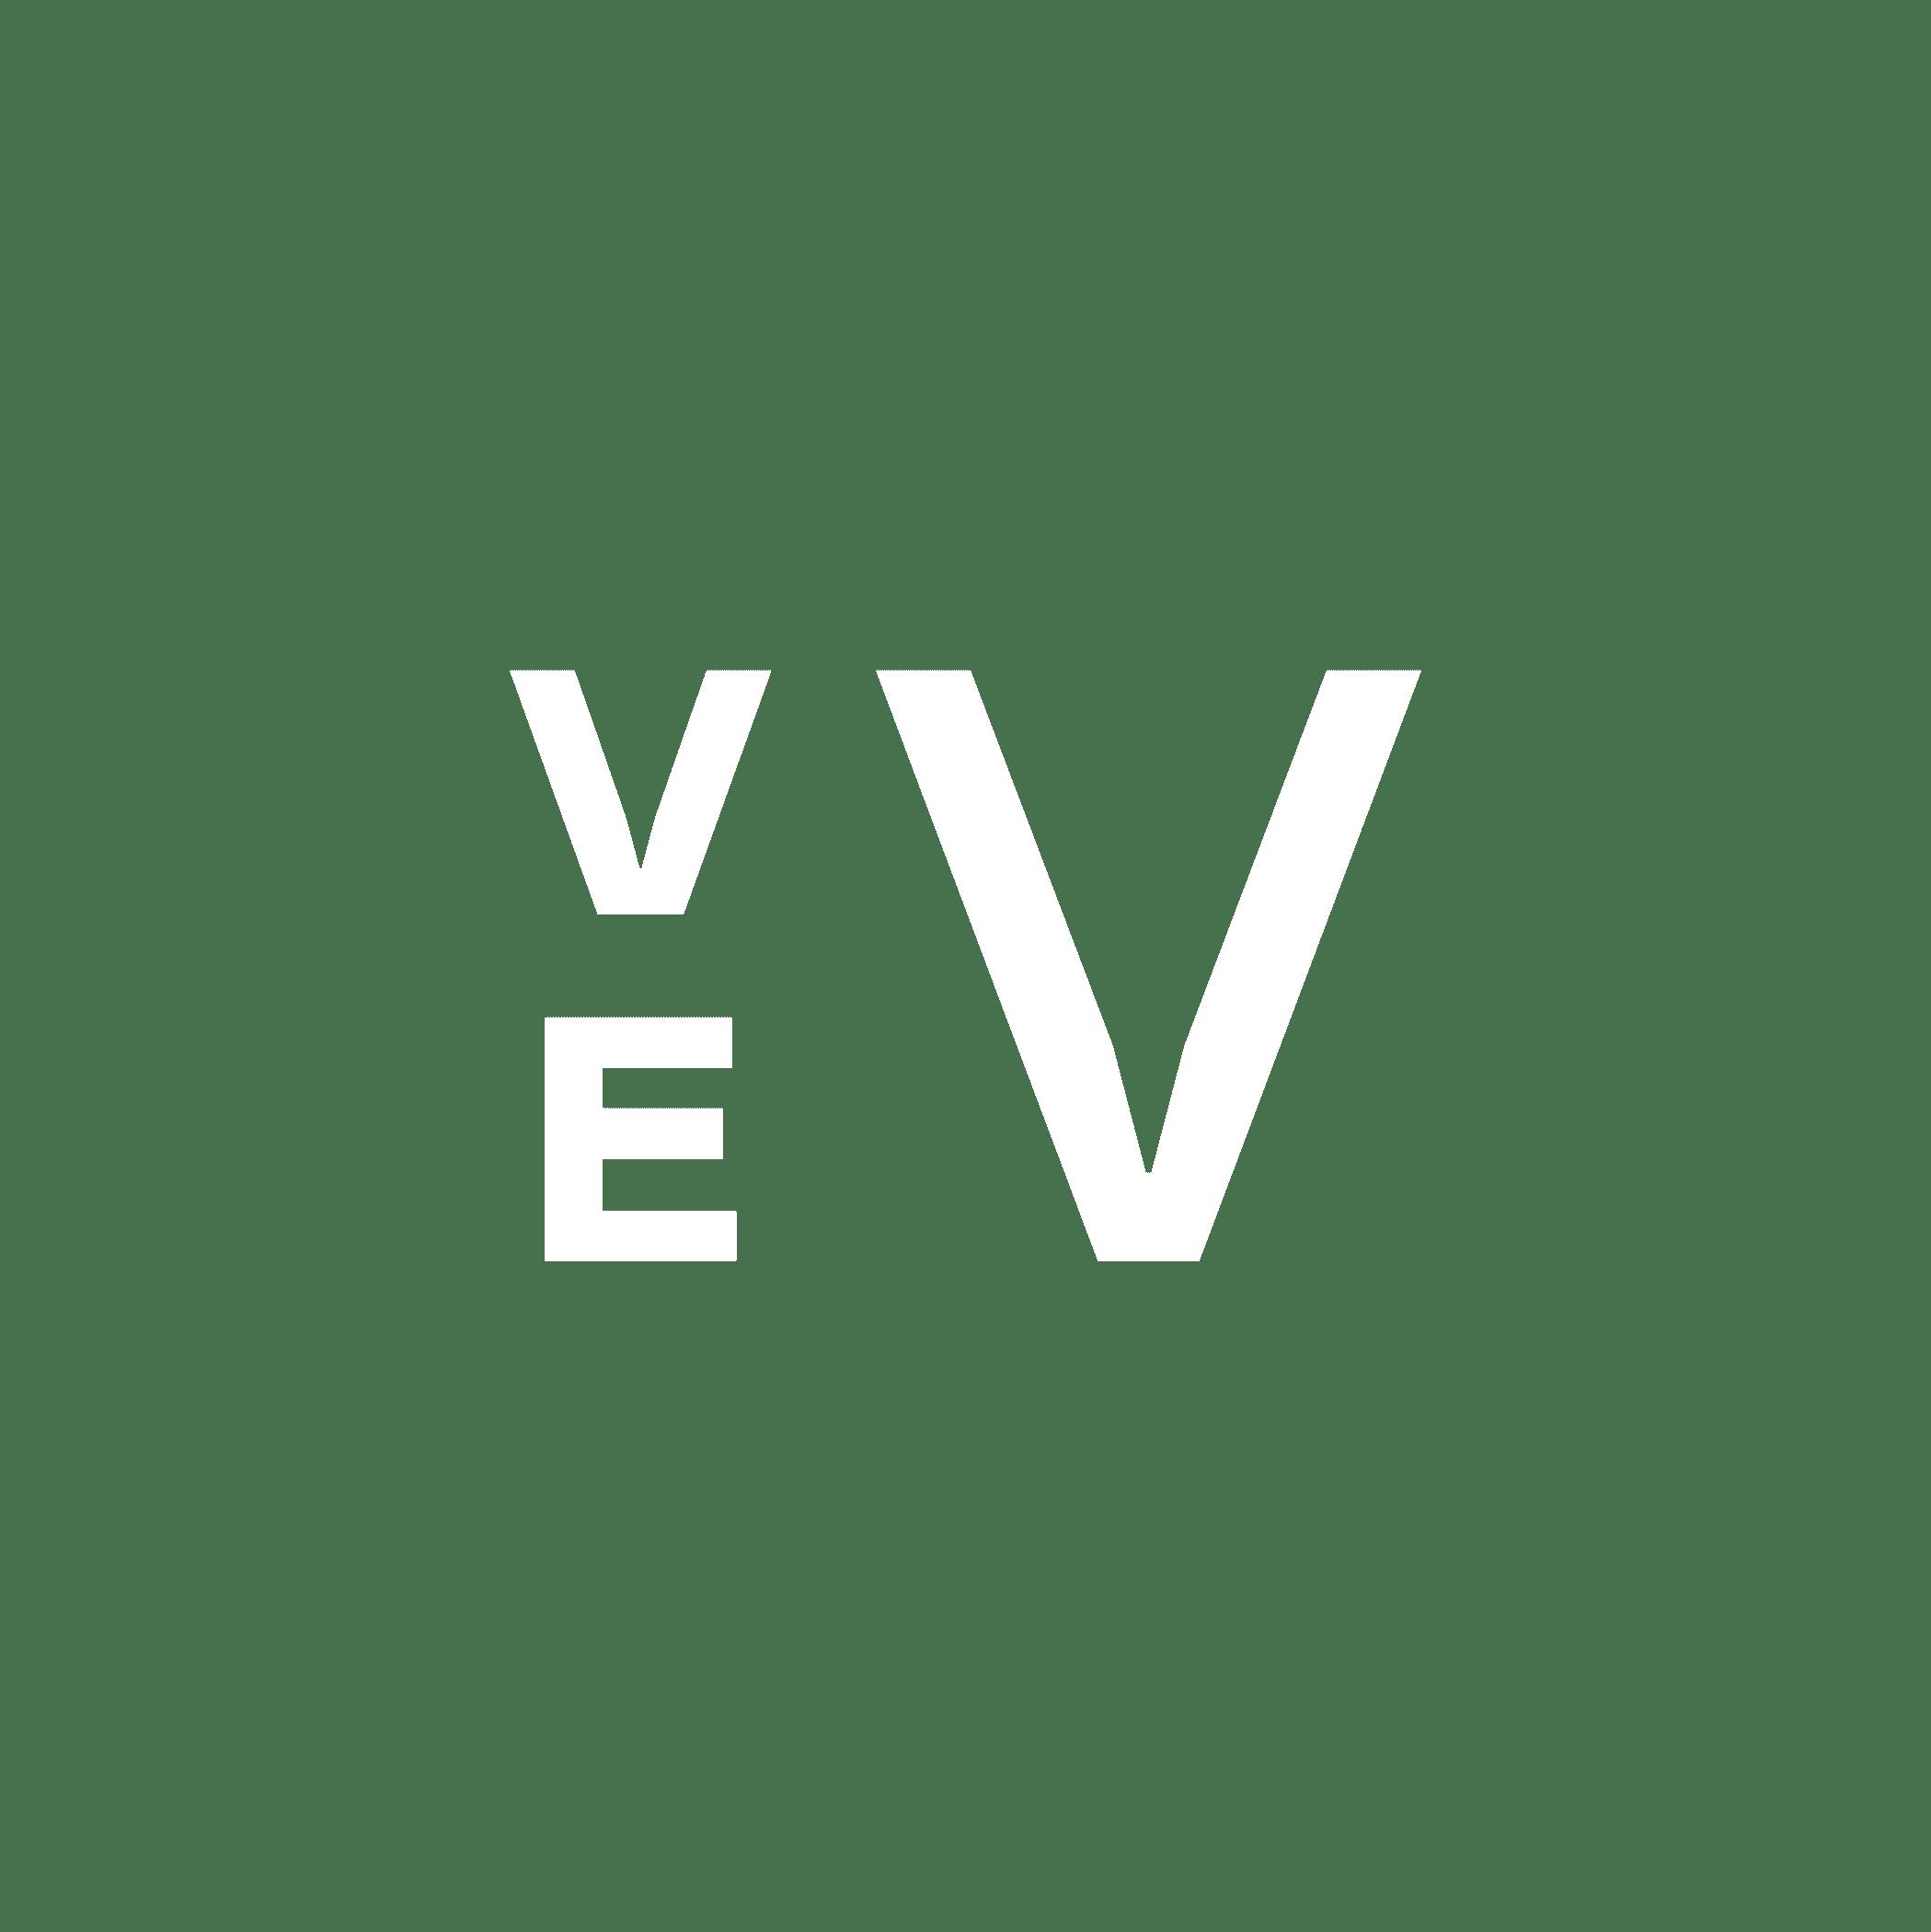 Logo_1x1_Hvit_RGB.png